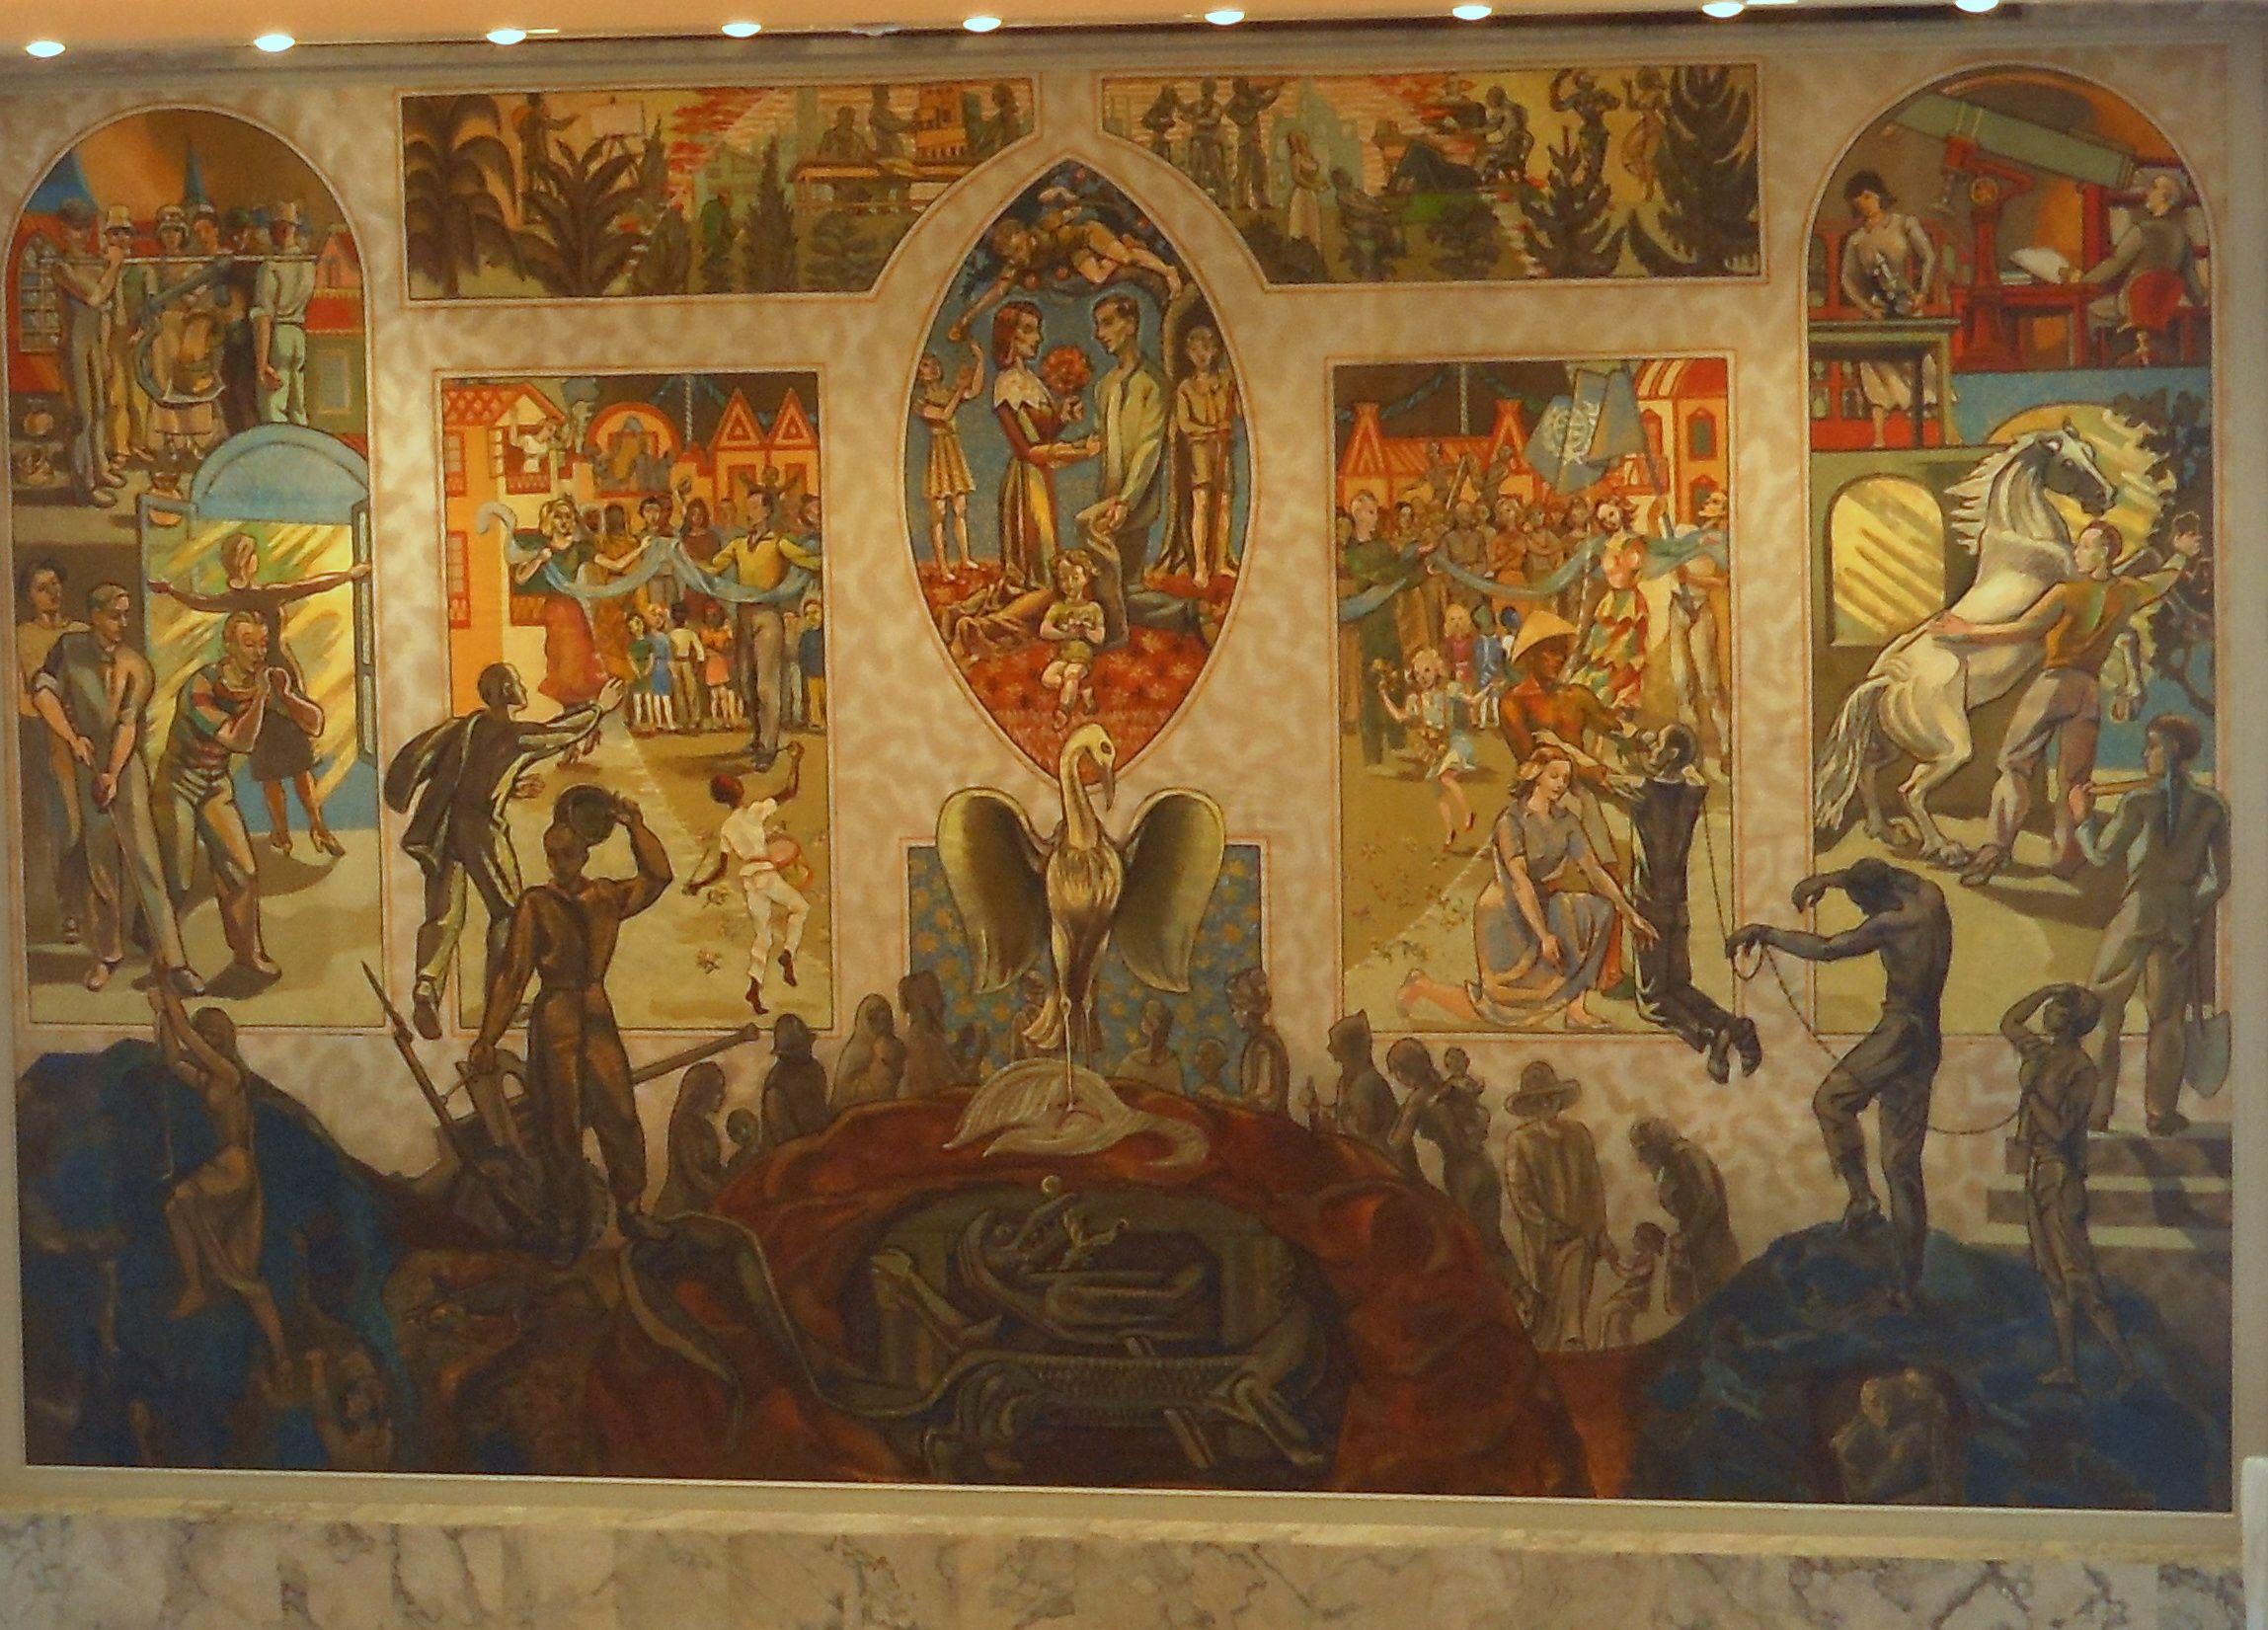 Un Security Council Mural By Sabloverviantart On